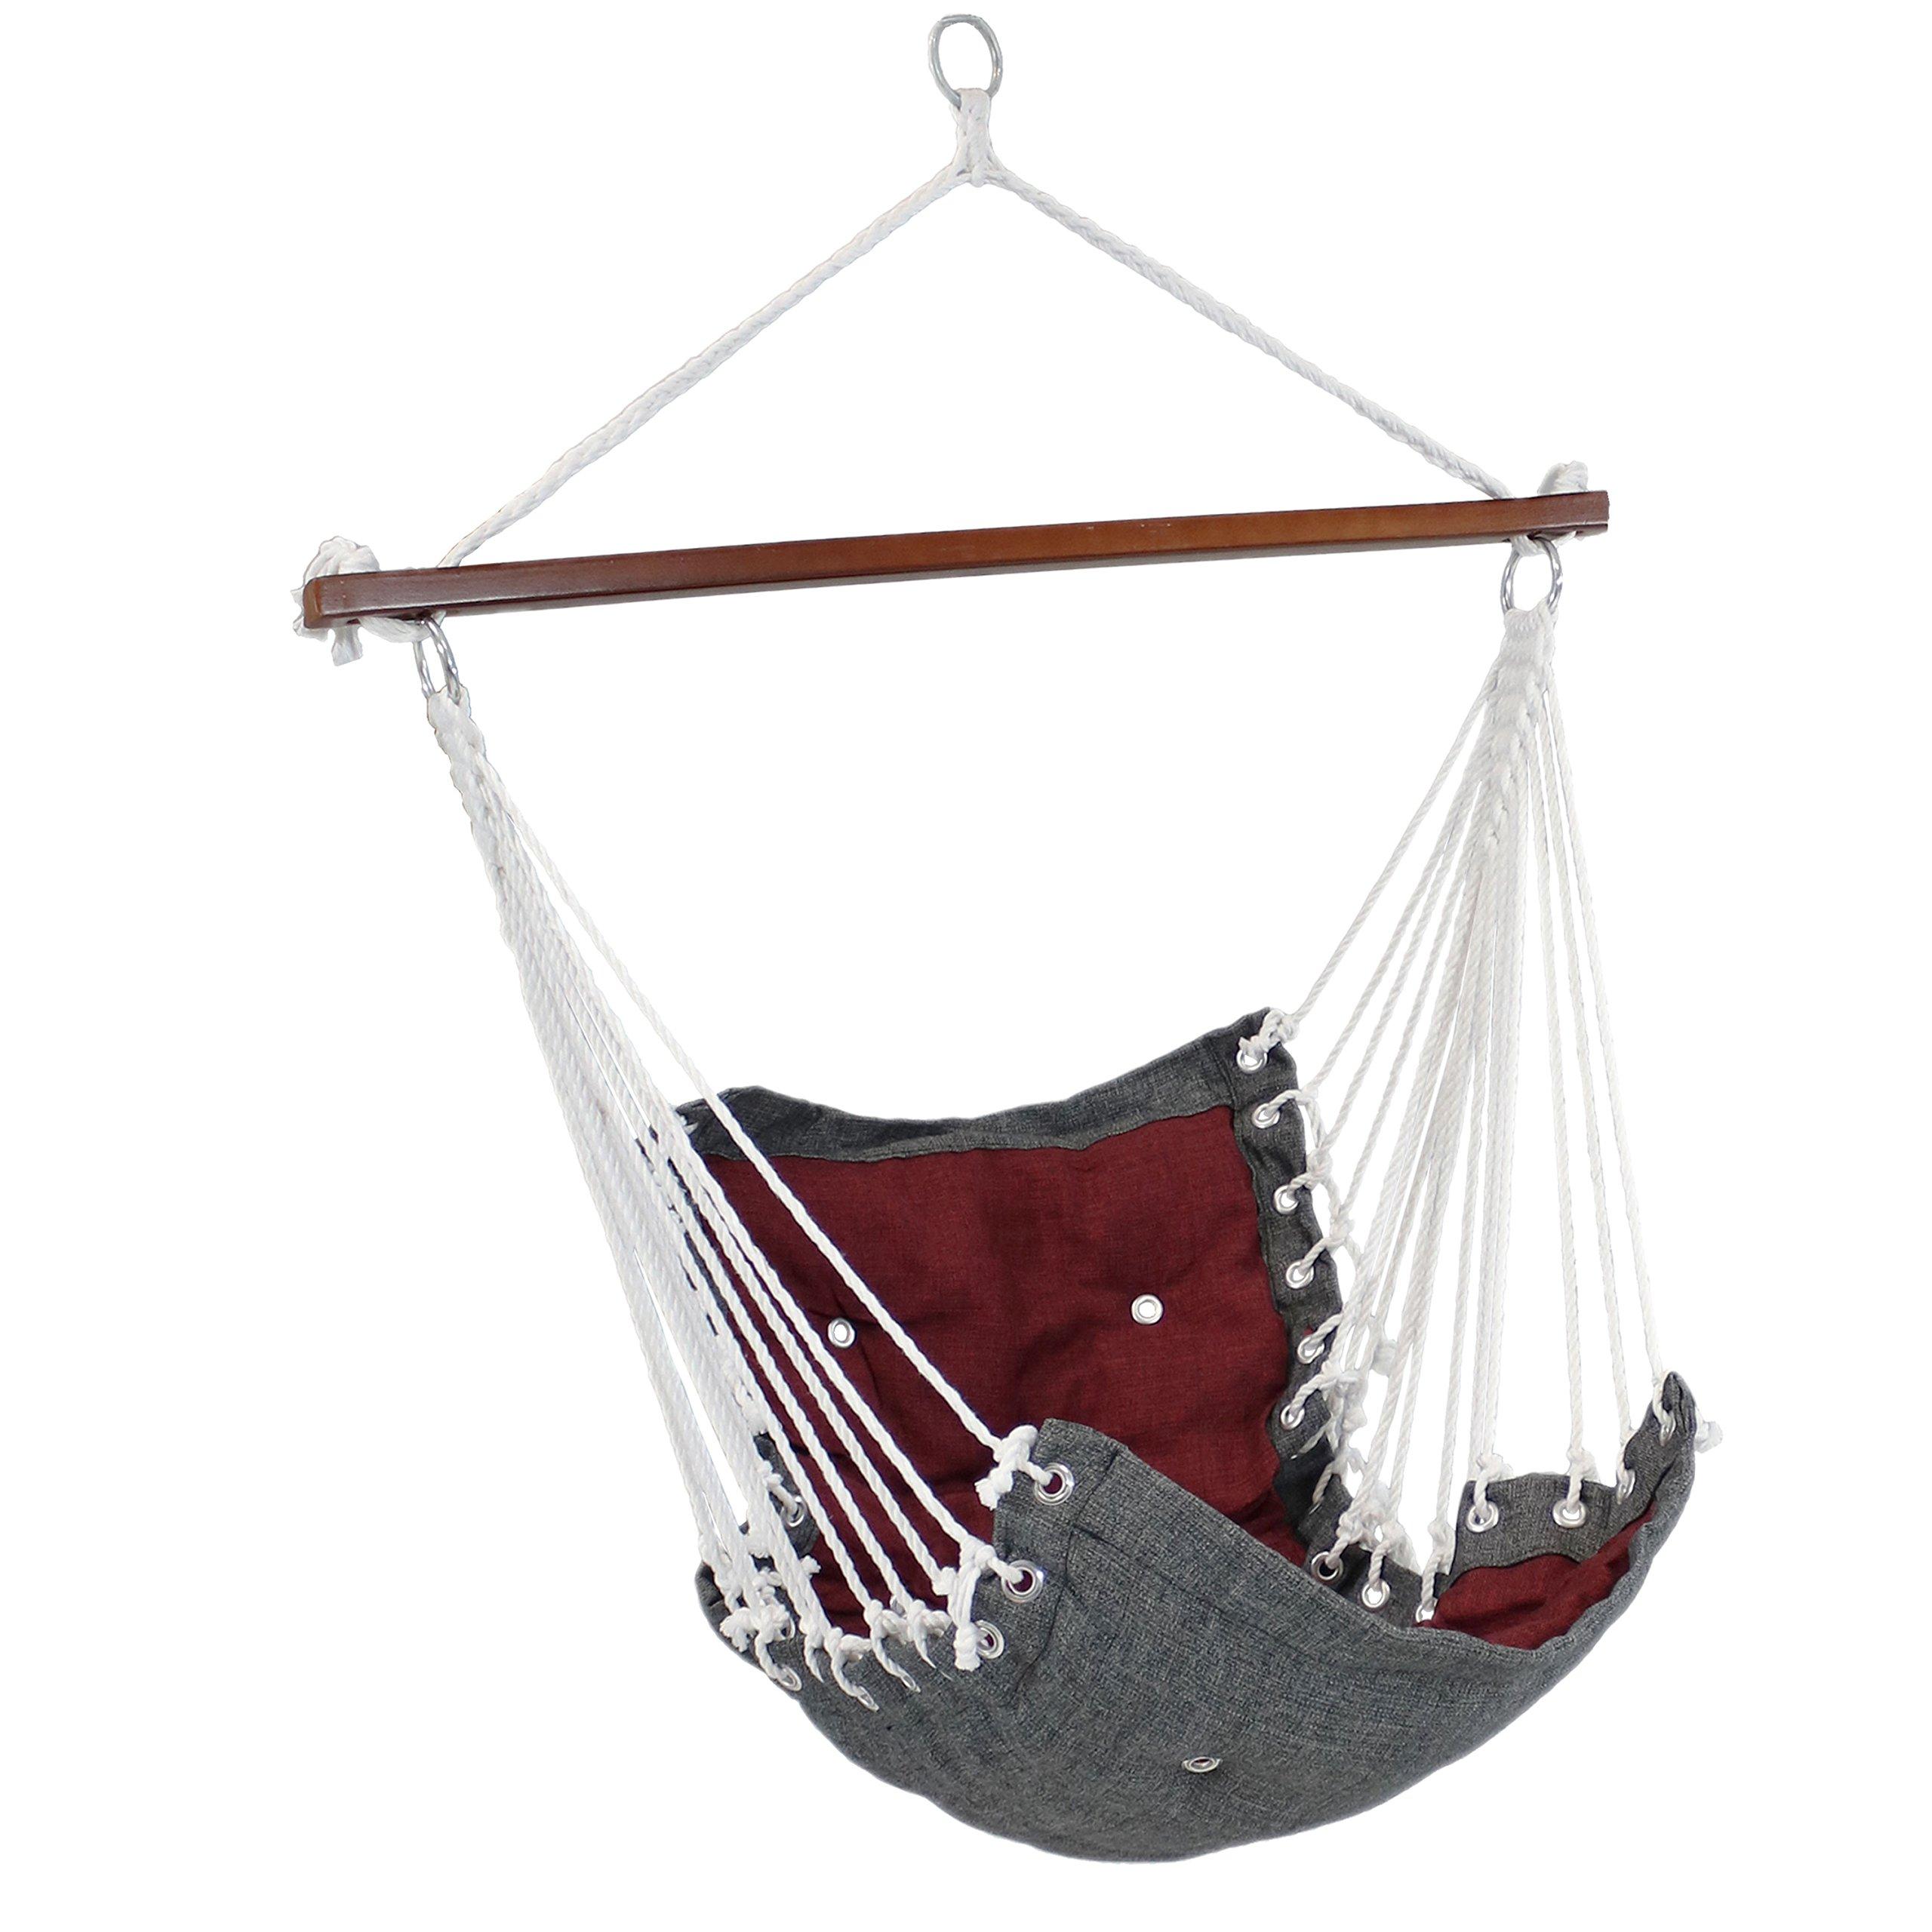 Sunnydaze Tufted Victorian Hammock Chair Buy Online In India At Desertcart